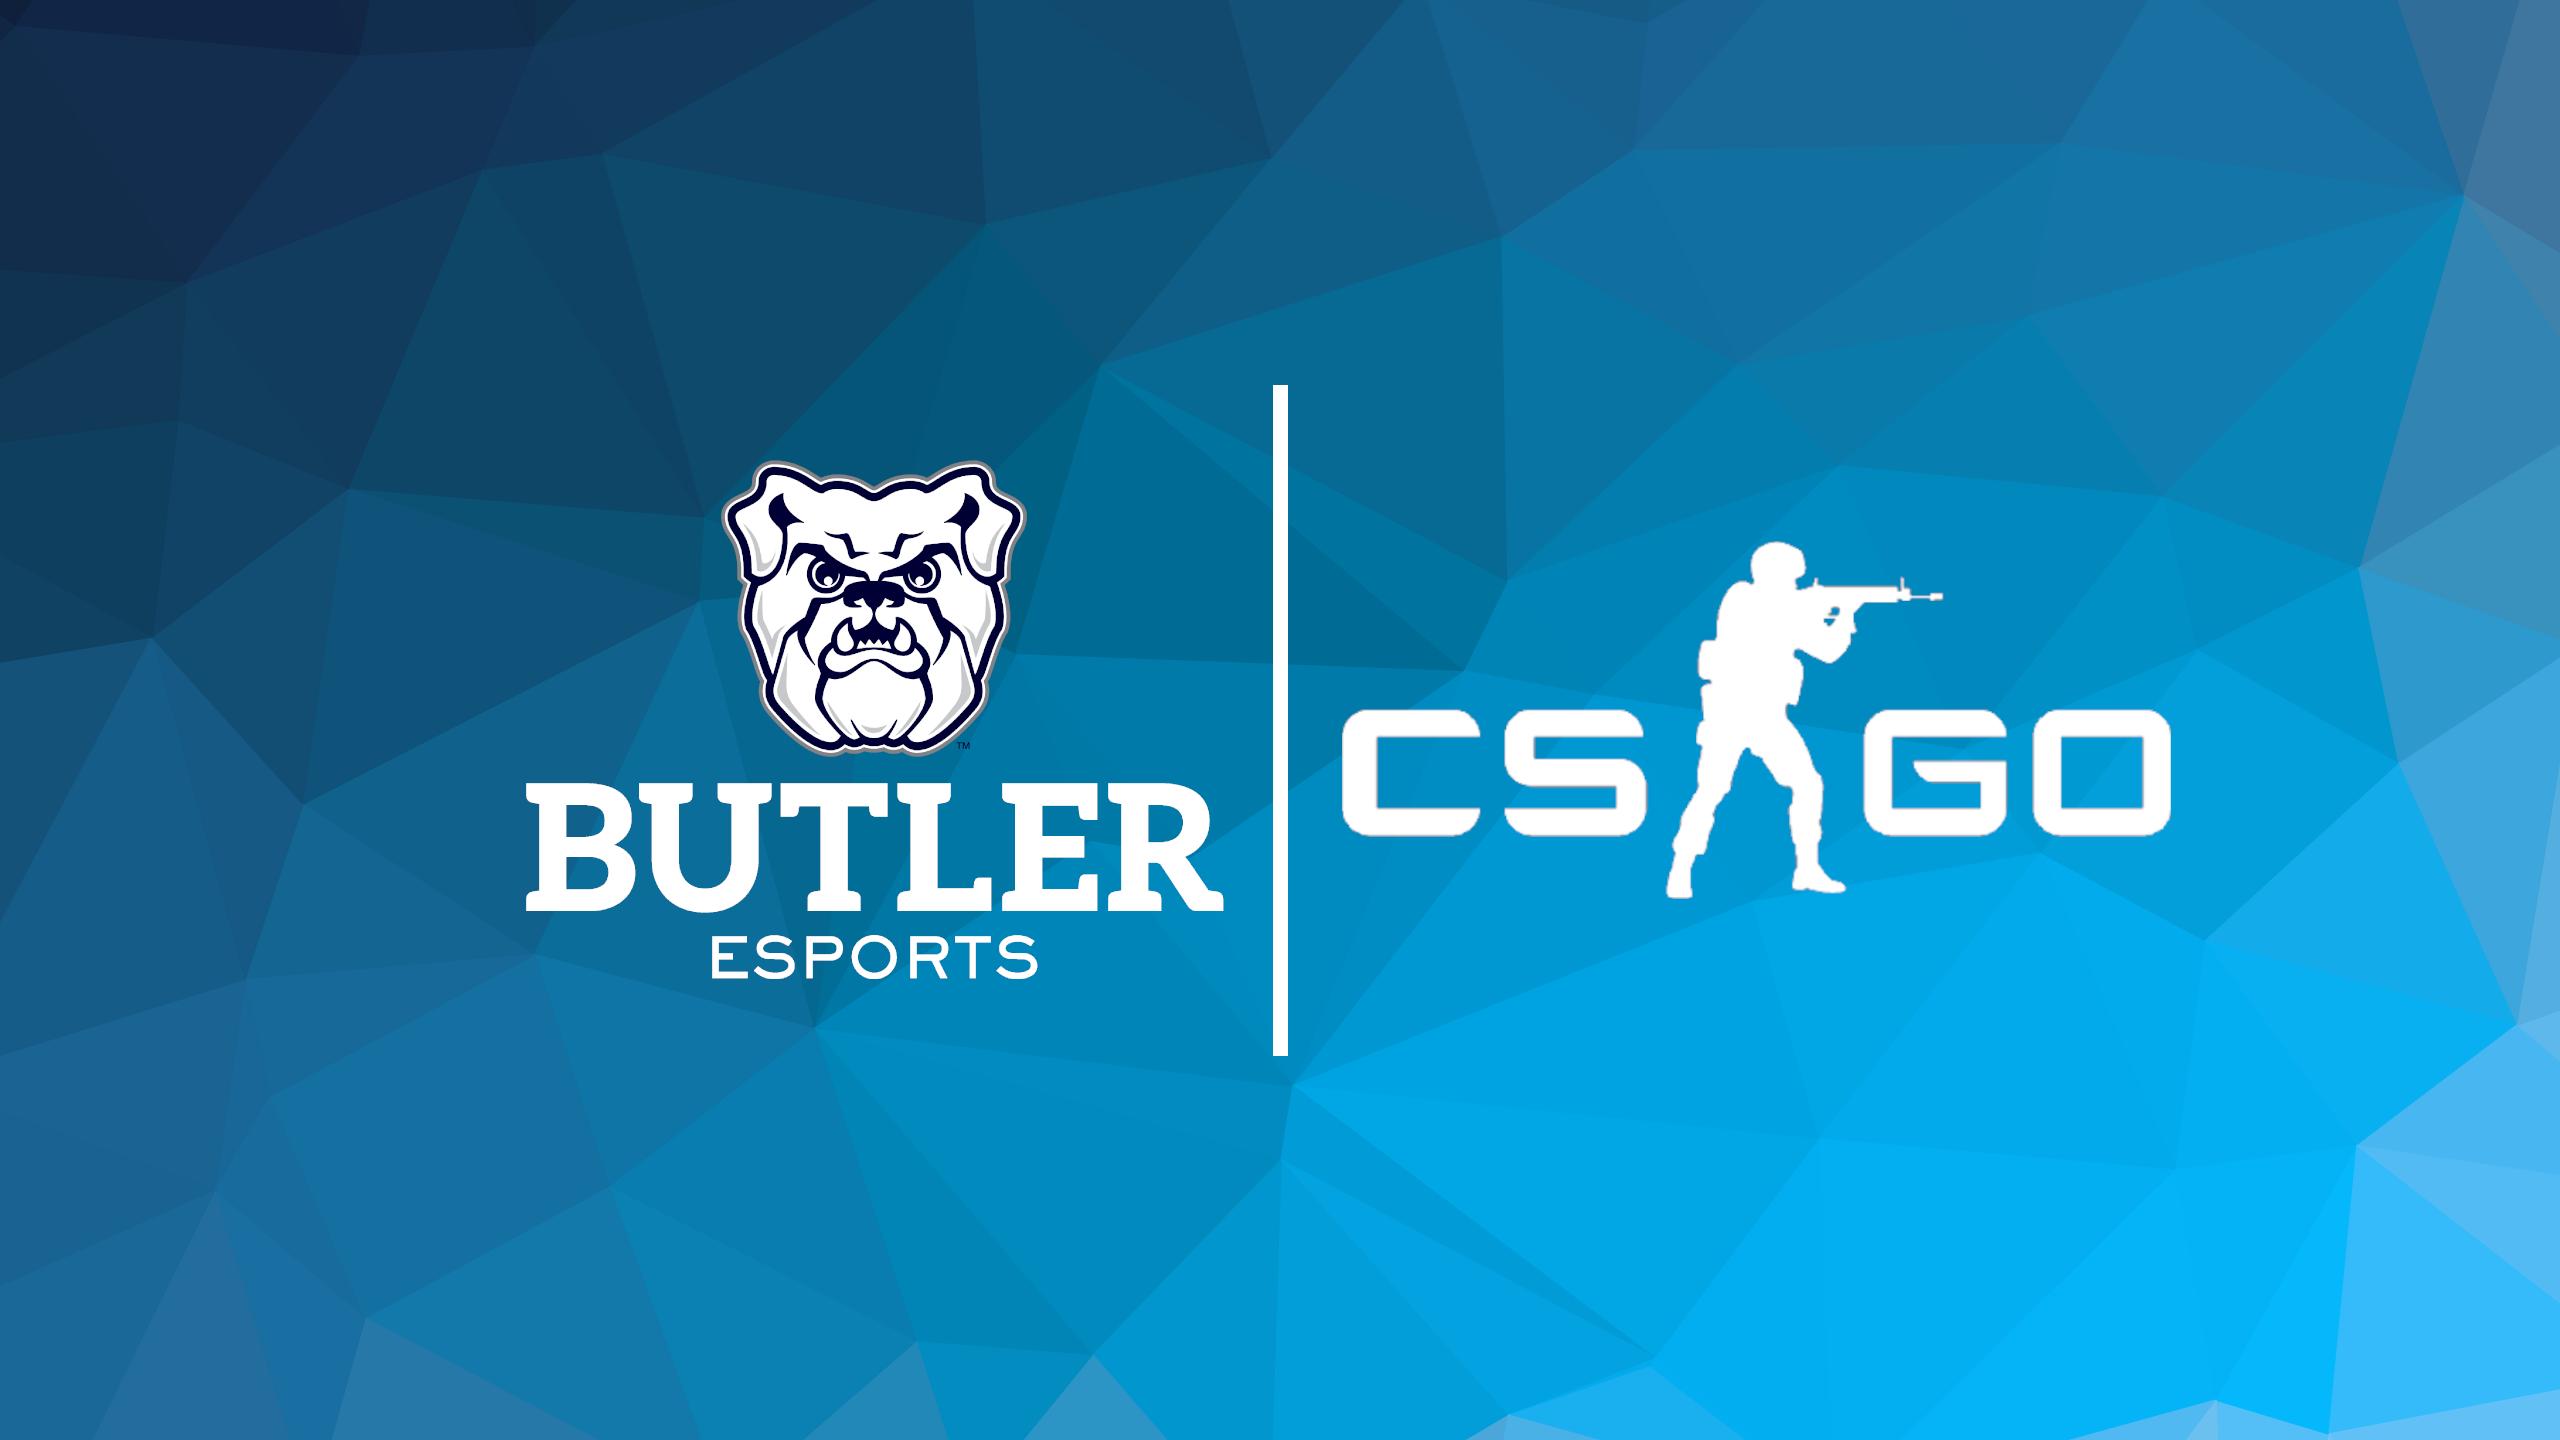 Butler CS:GO vs Michigan State University